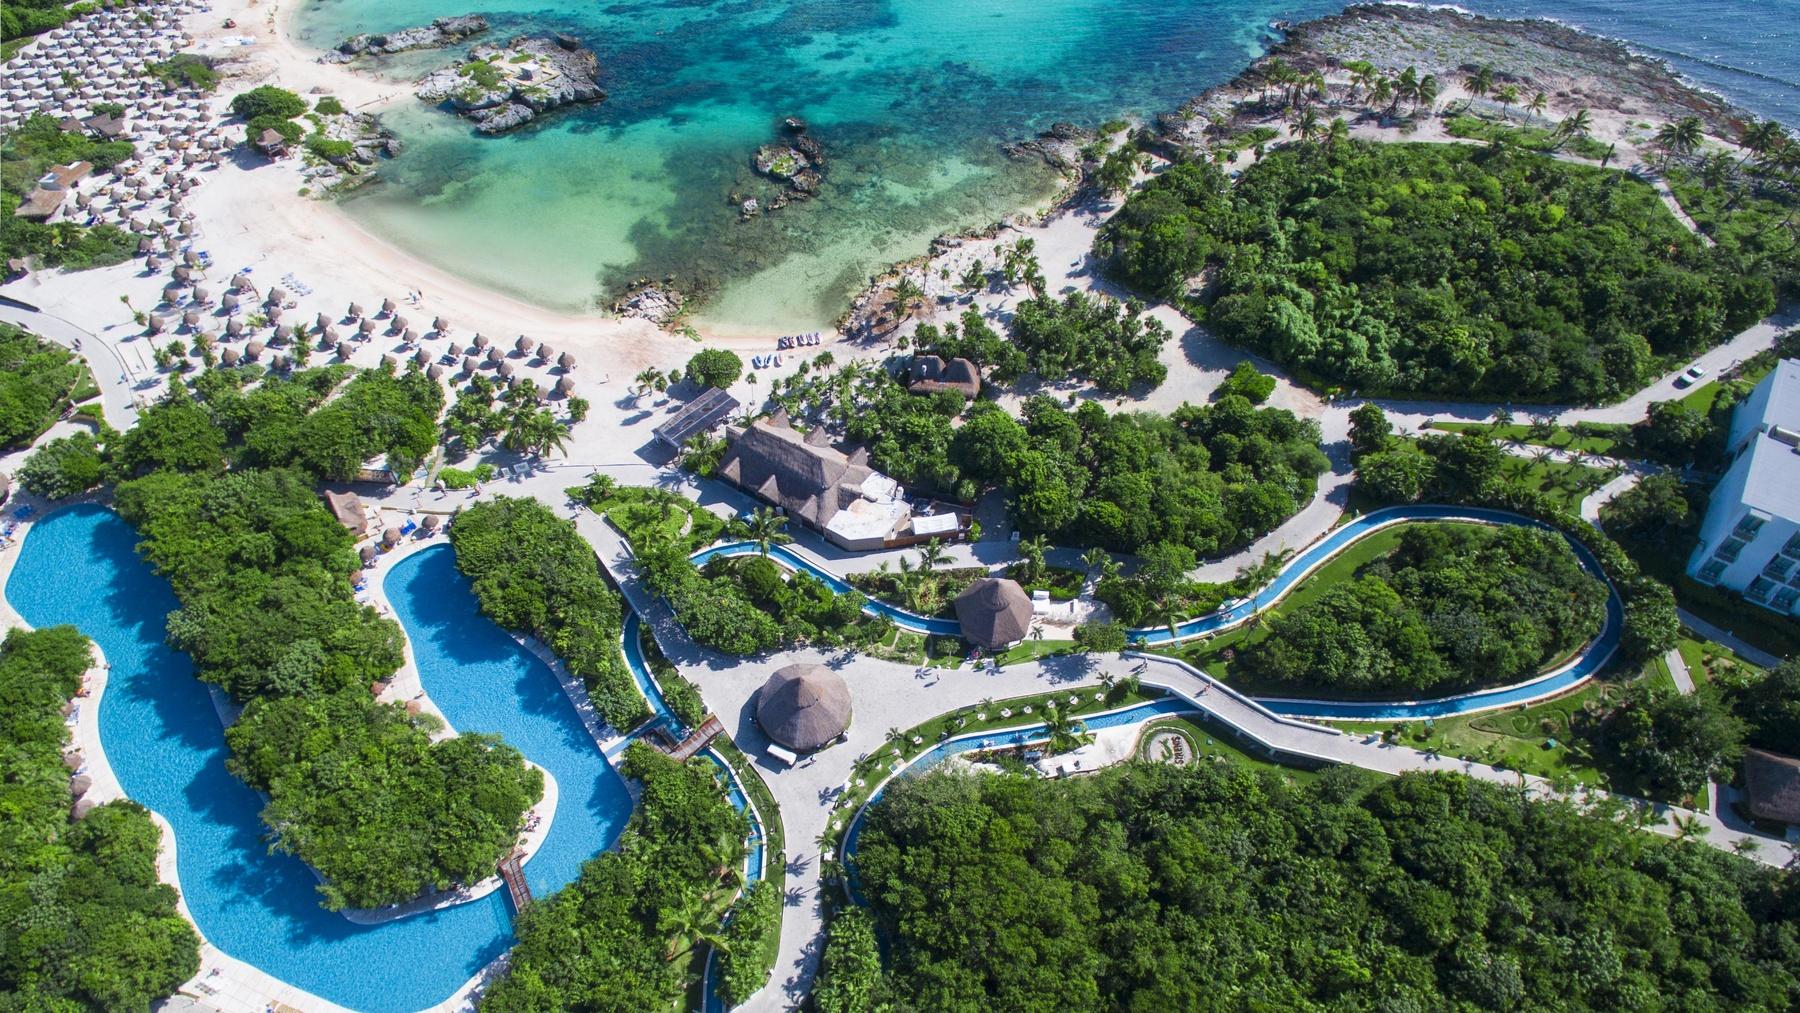 grand sirenis riviera maya sirenis riviera maya sirenis hotels all inclusive resort contact us. Black Bedroom Furniture Sets. Home Design Ideas